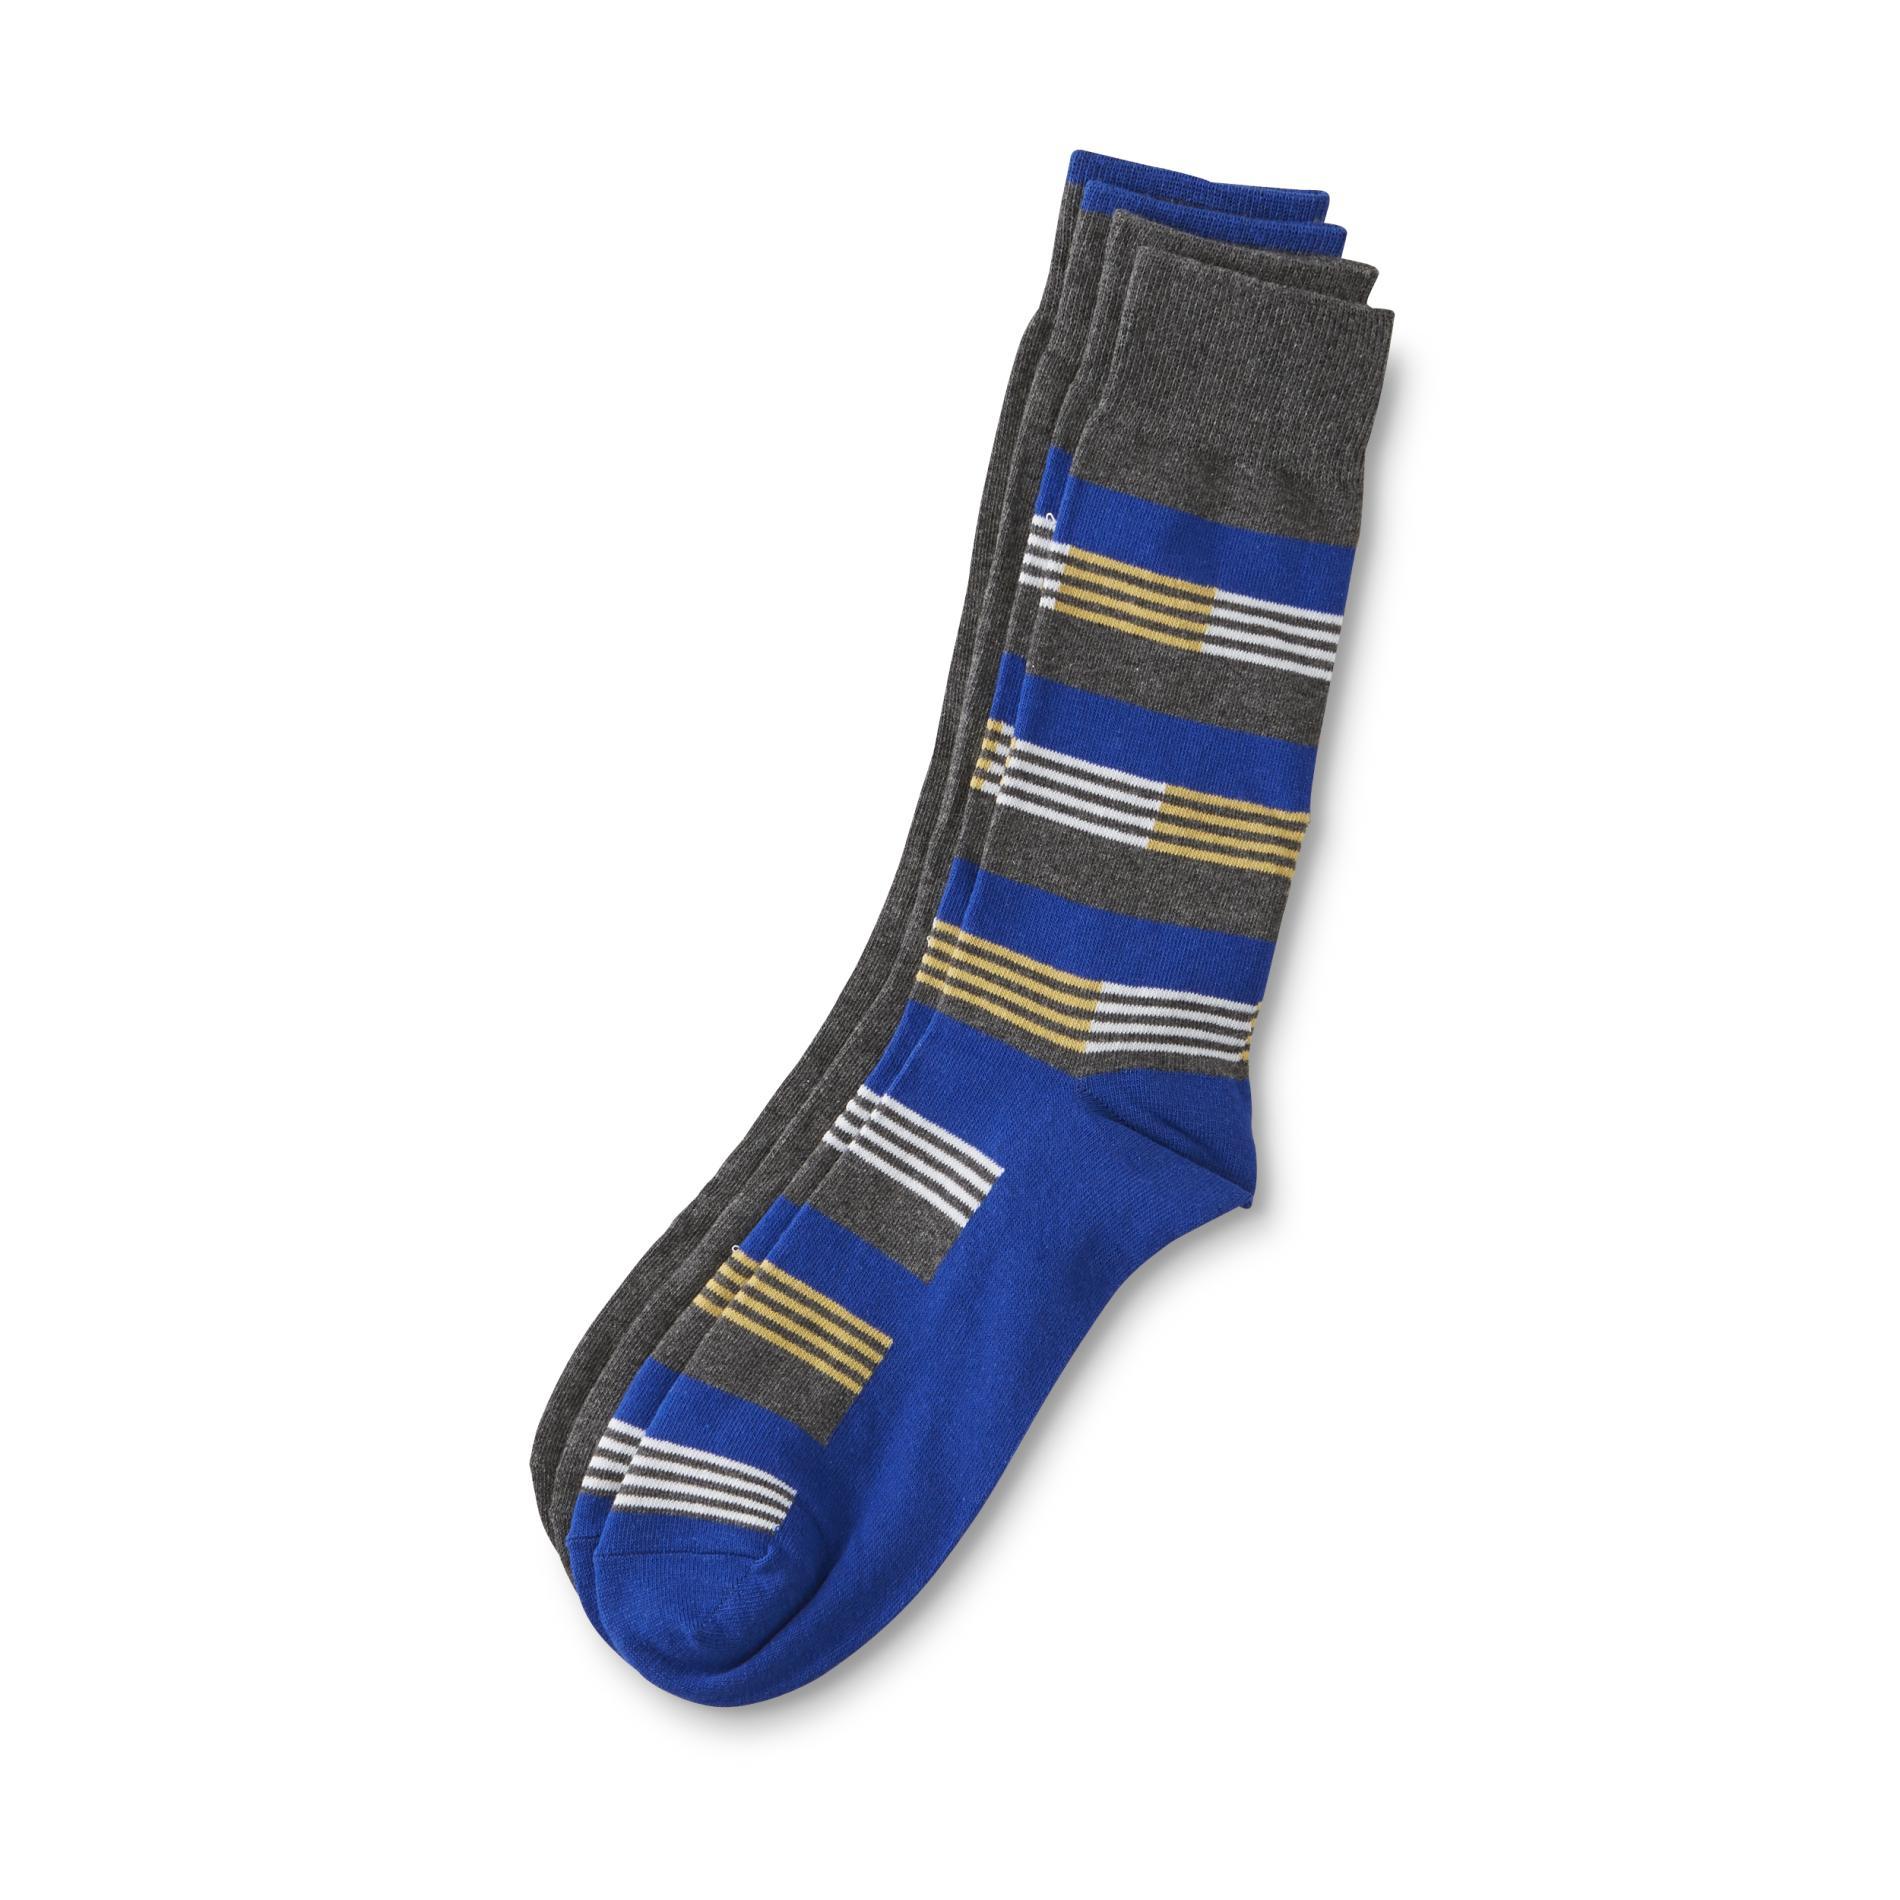 Structure Men's 2-Pairs Crew Socks - Striped